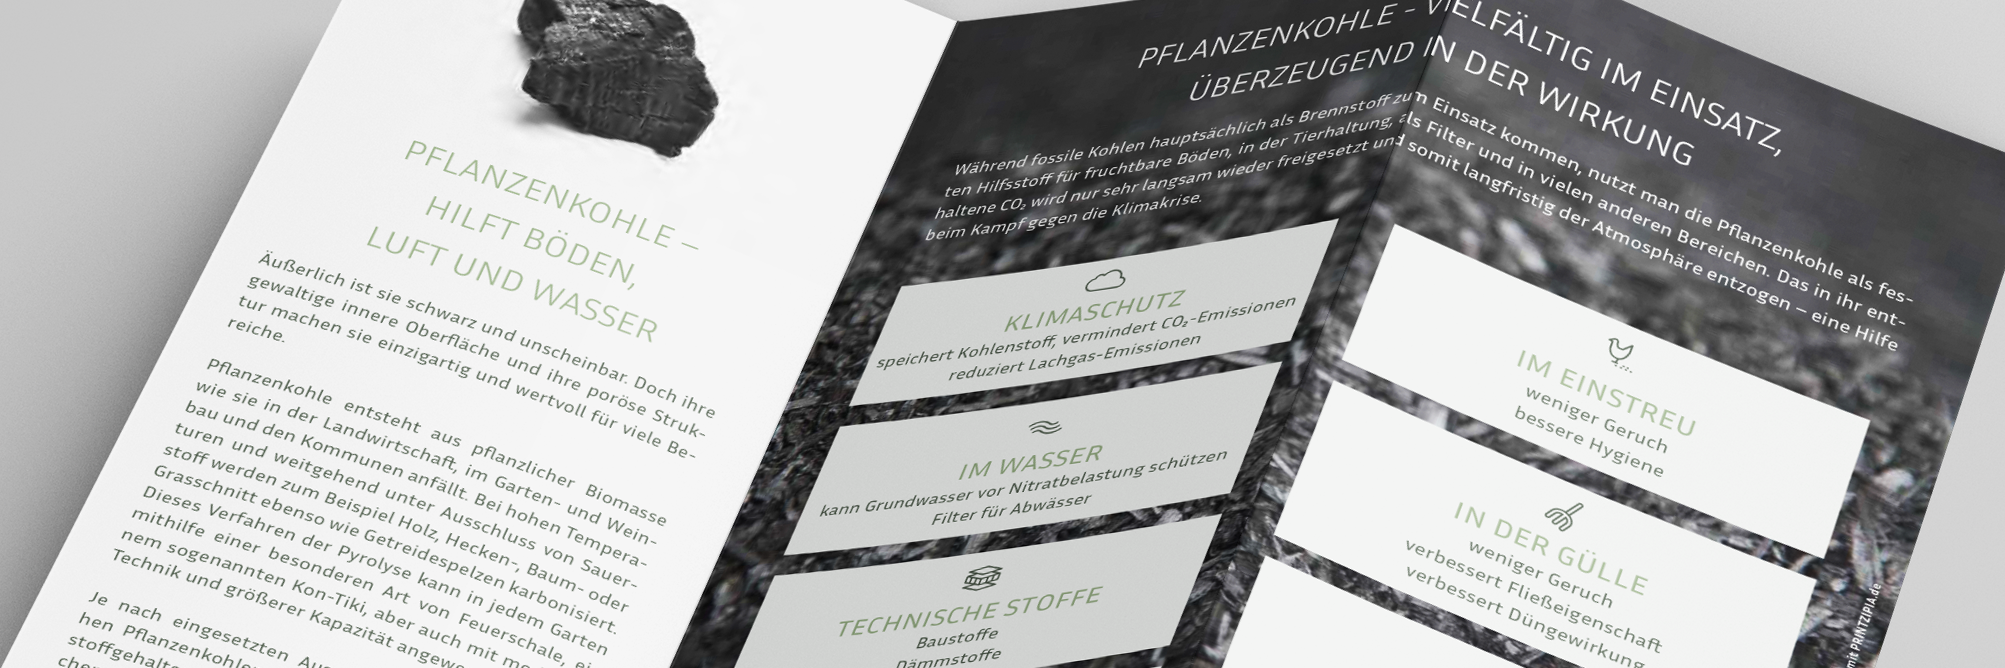 detail of brochure german biochar association